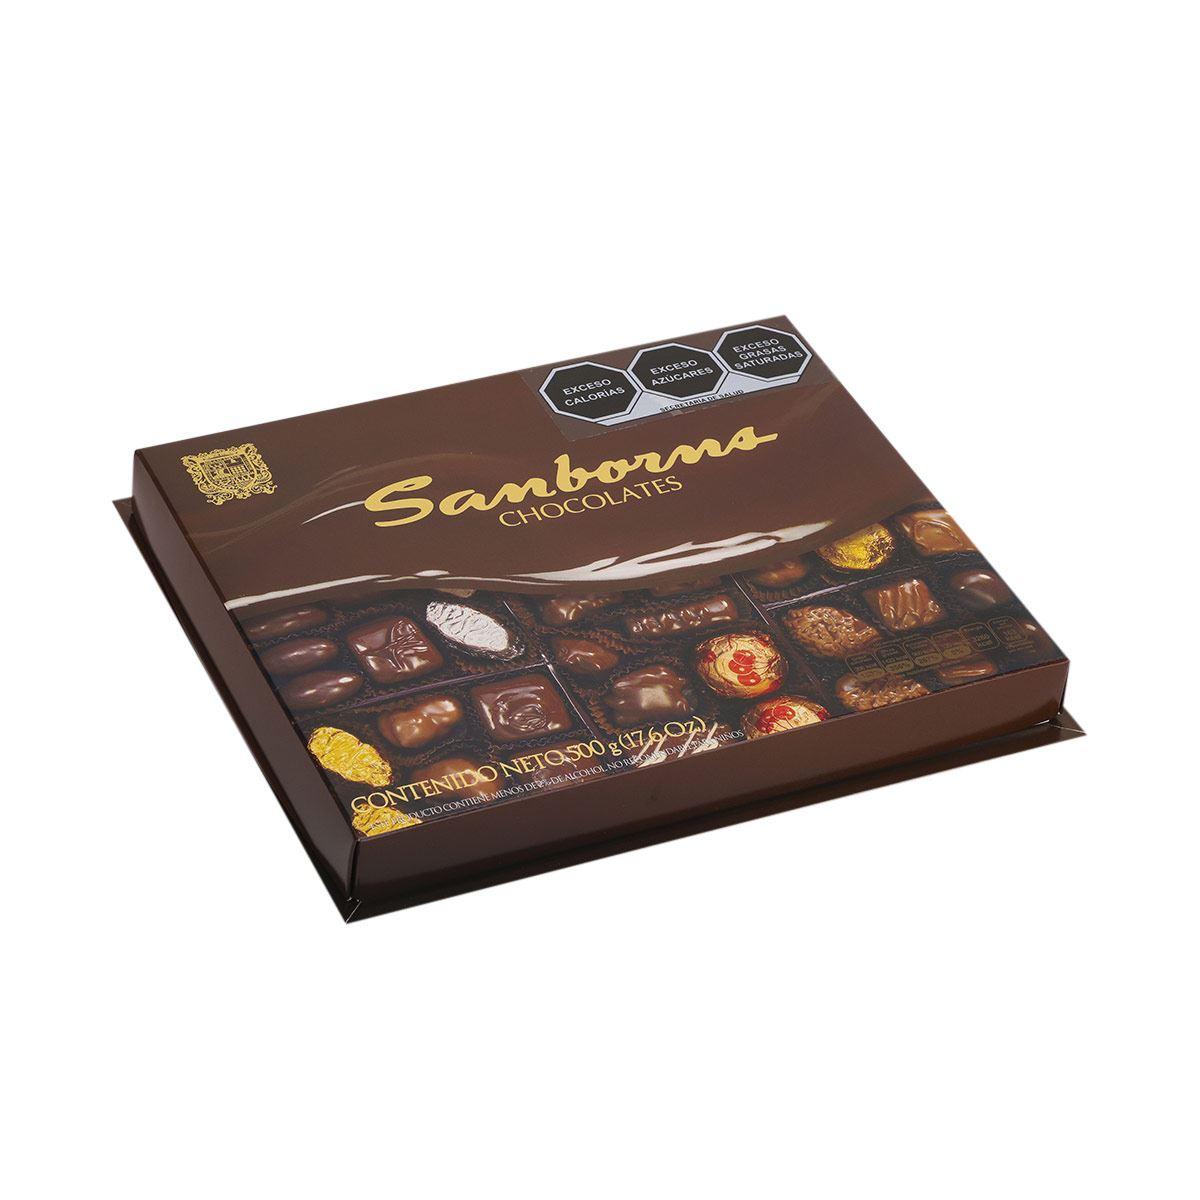 Caja de Chocolates Sanborns 500g